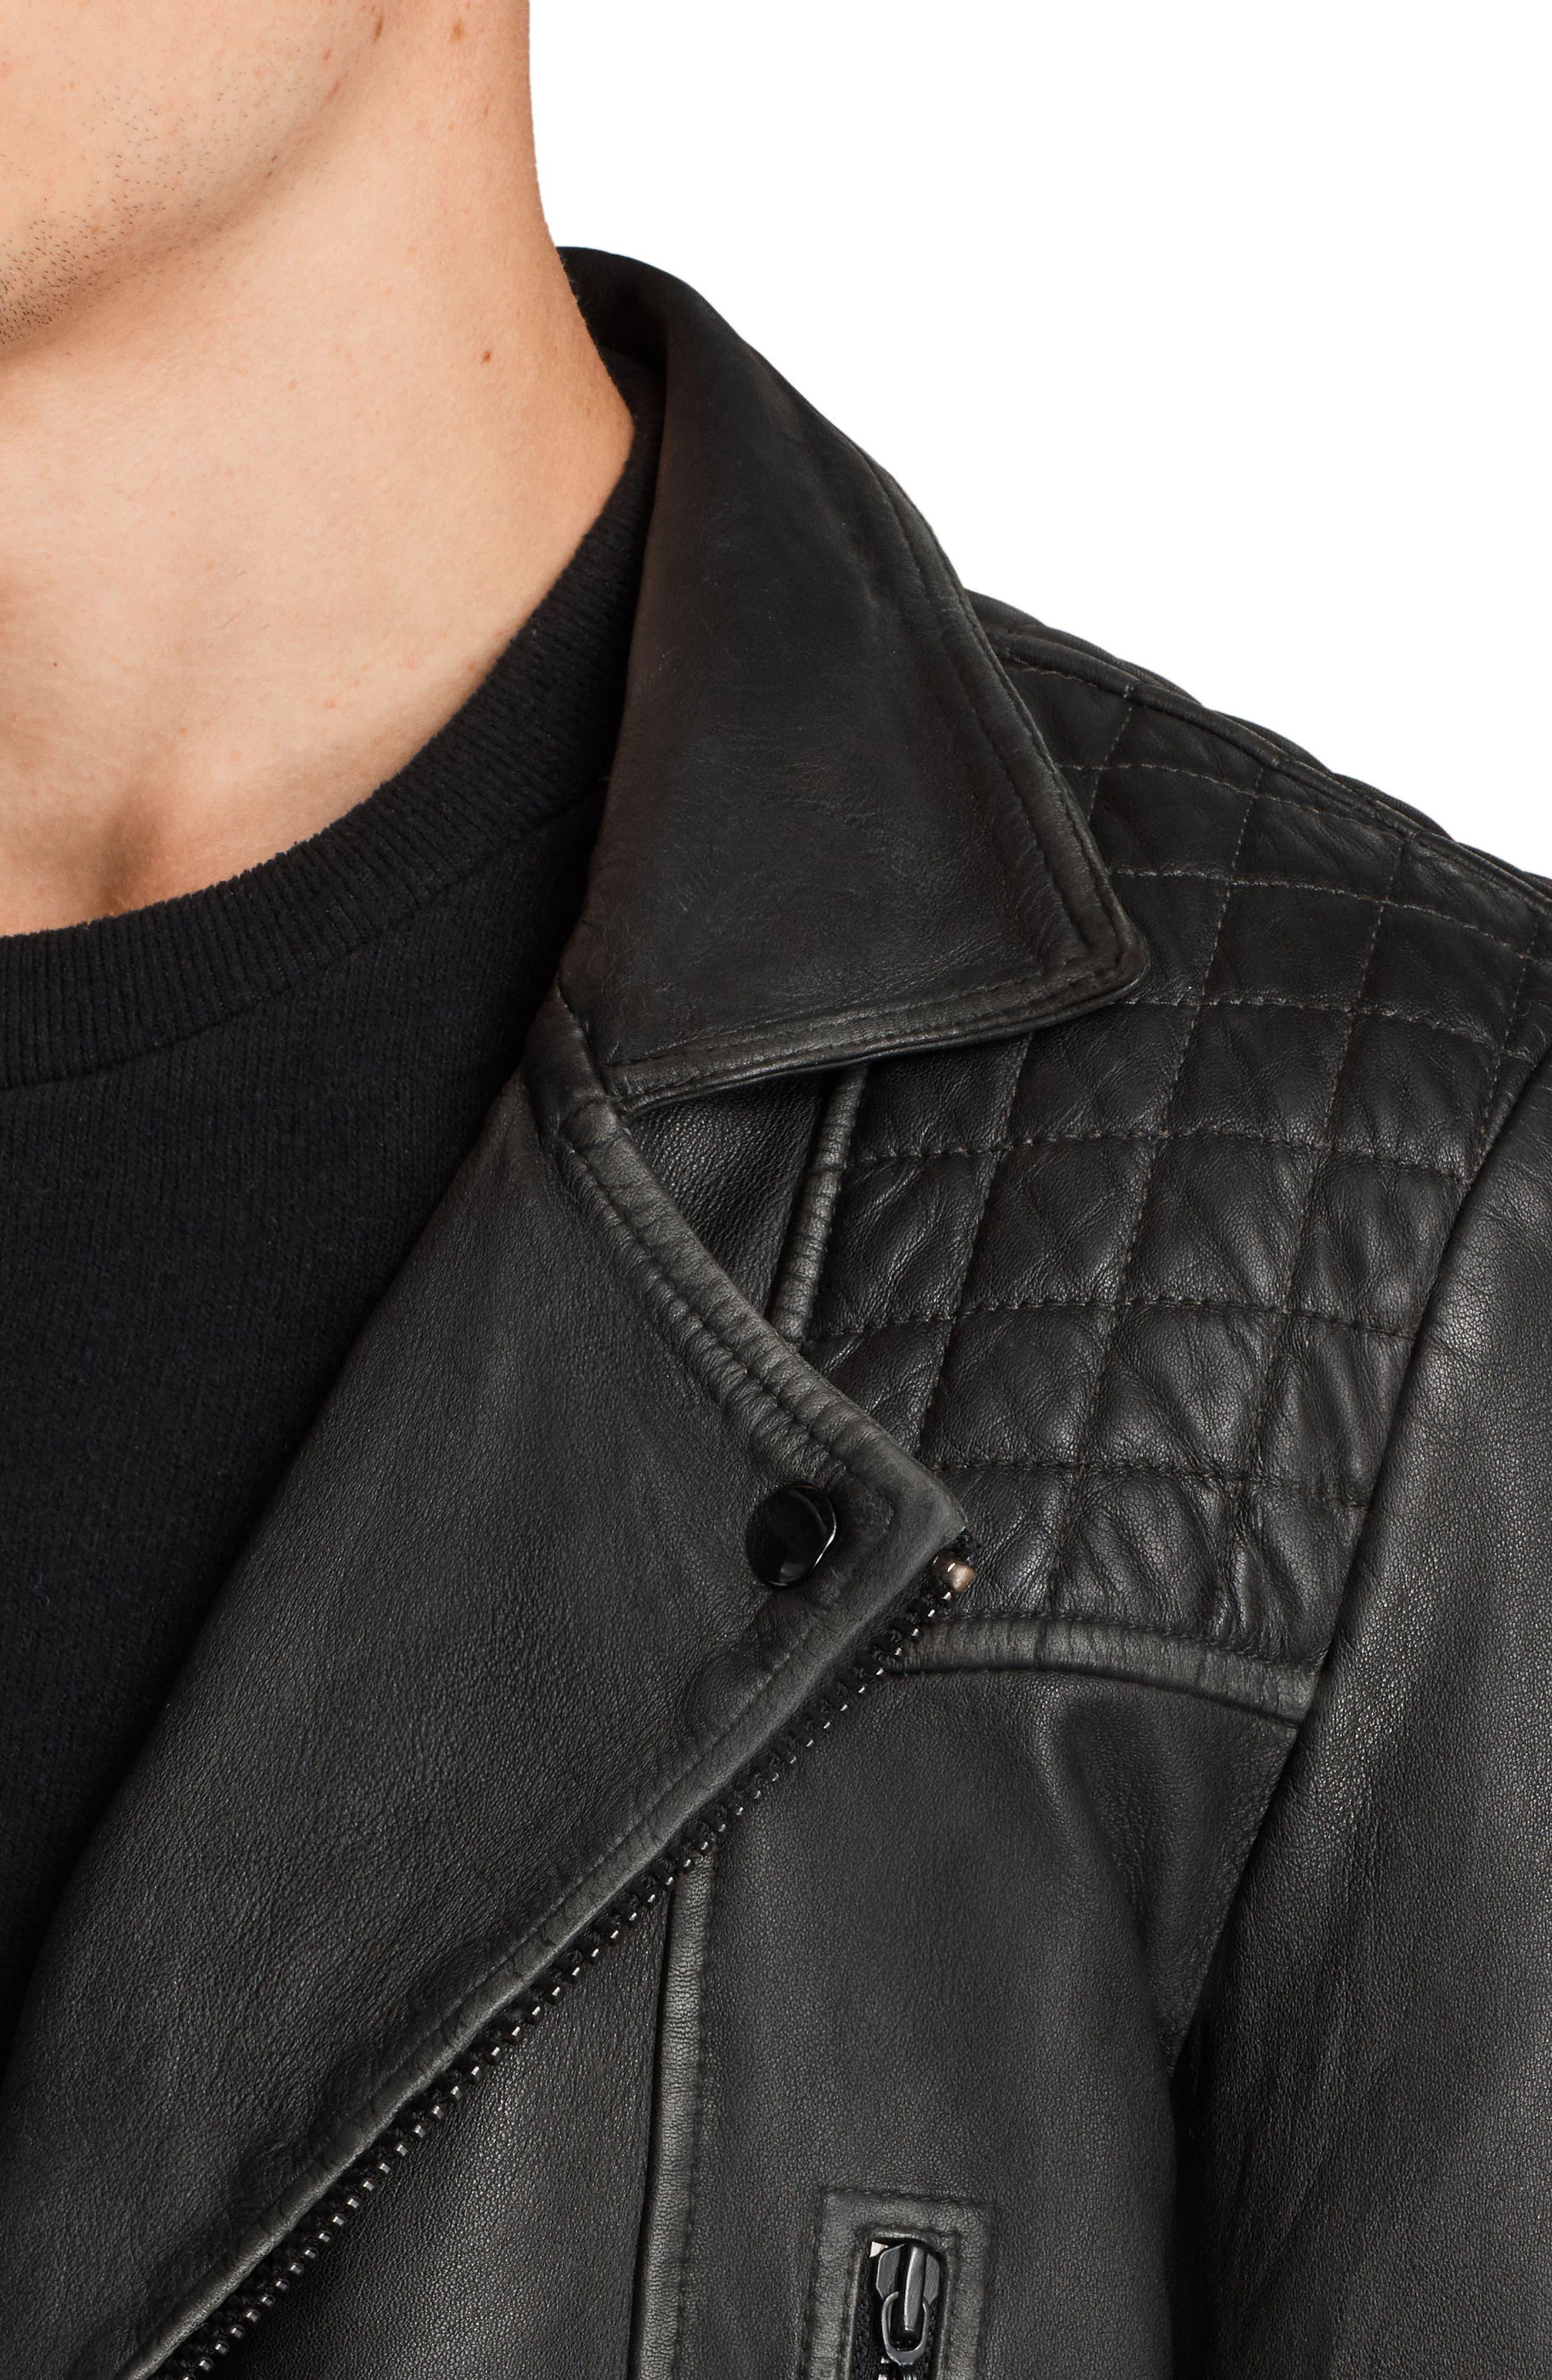 Cargo Biker Slim Fit Leather Jacket,                             Alternate thumbnail 3, color,                             BLACK GREY